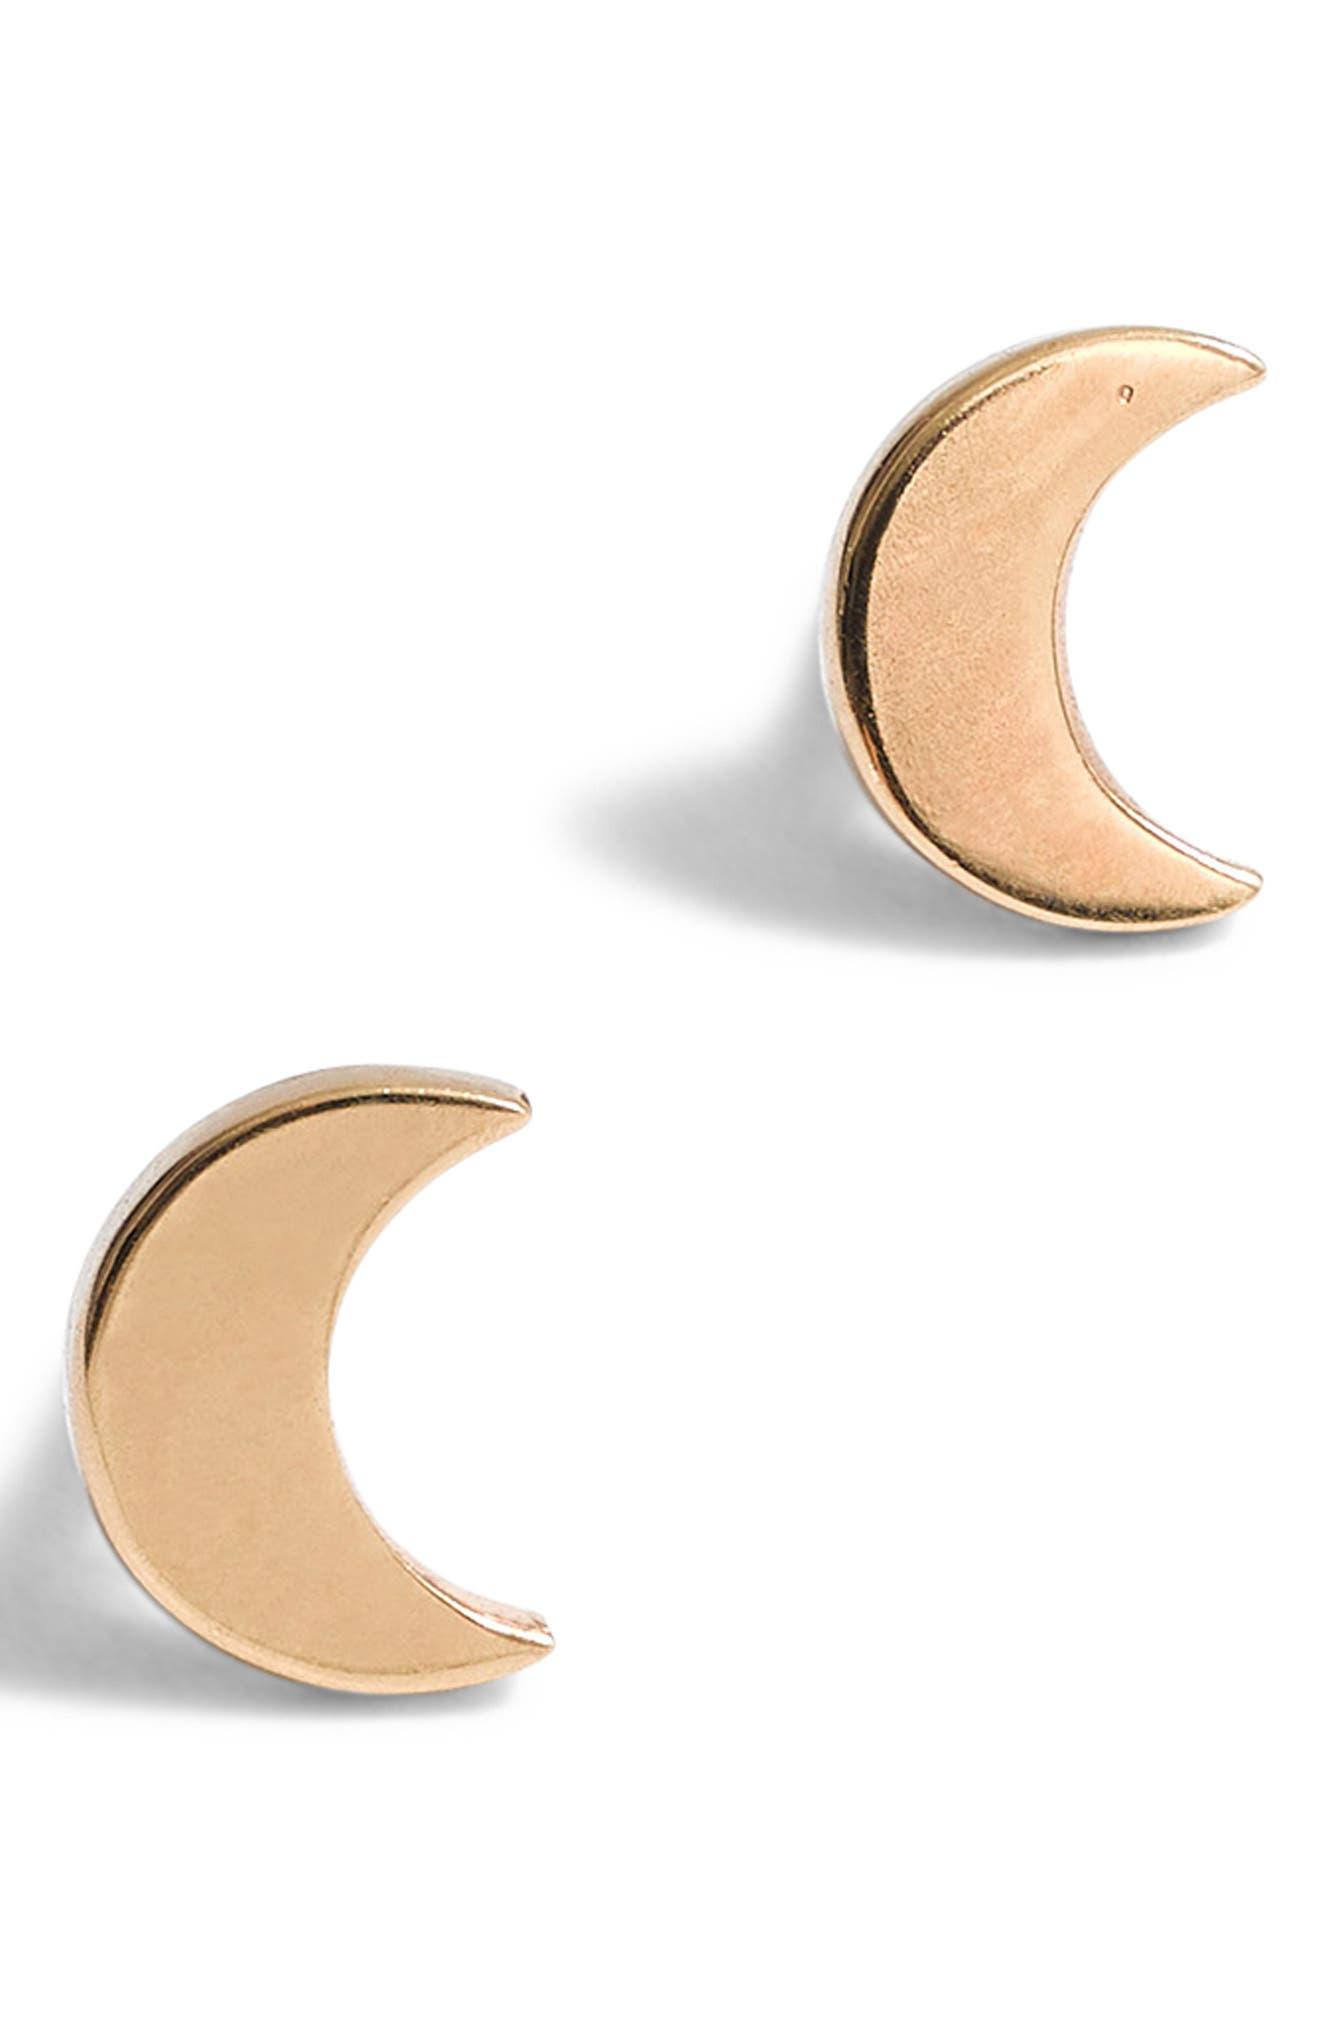 Vermeil Crescent Moon Stud Earrings,                         Main,                         color, VERMEIL